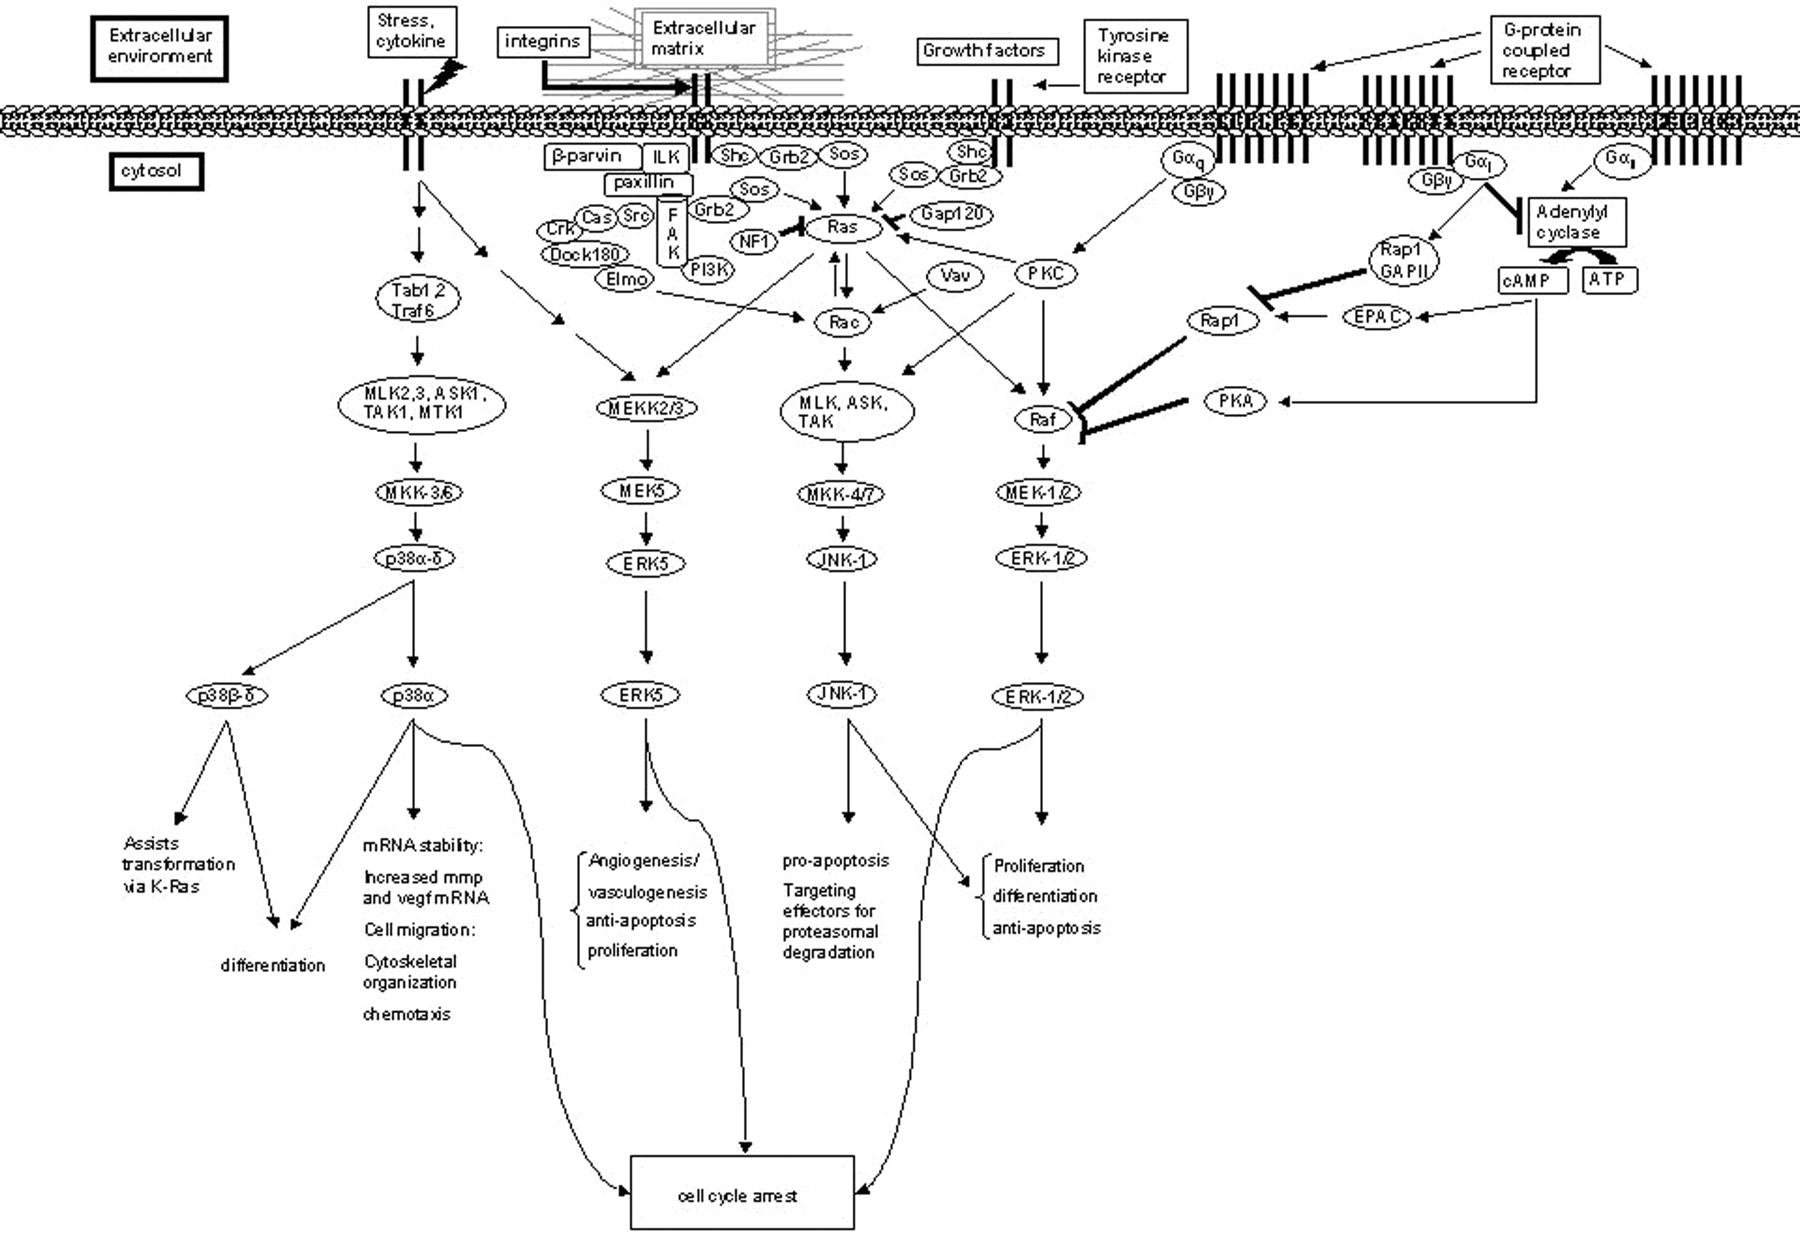 mitogen map kinase